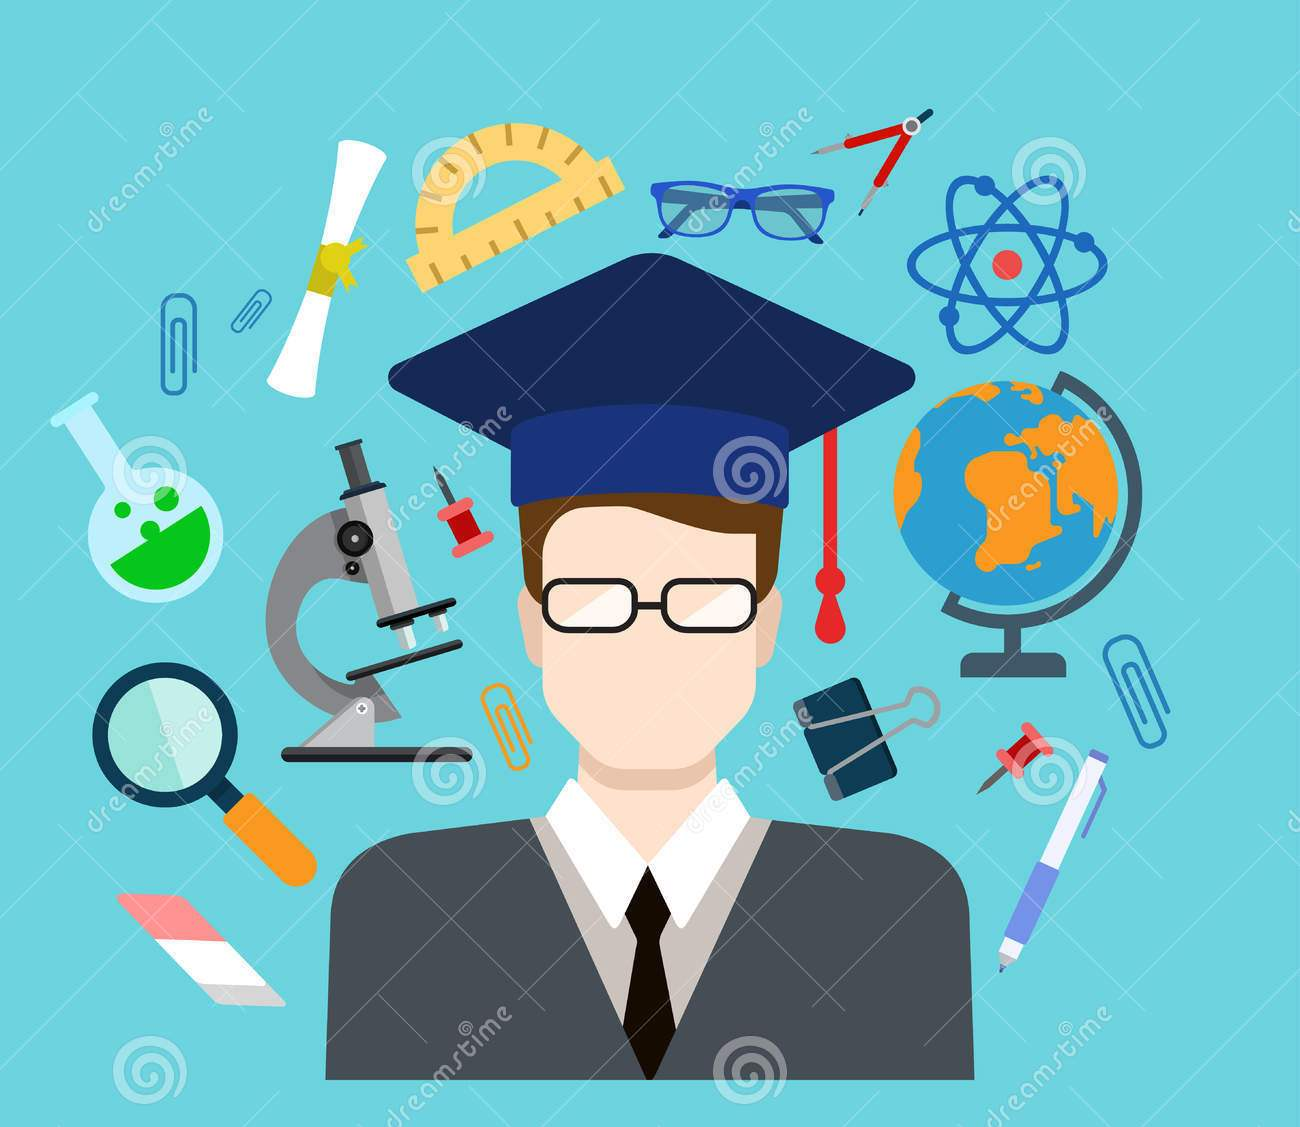 Portal-Portal Beasiswa Dalam Negeri Yang Perlu Kamu Tahu